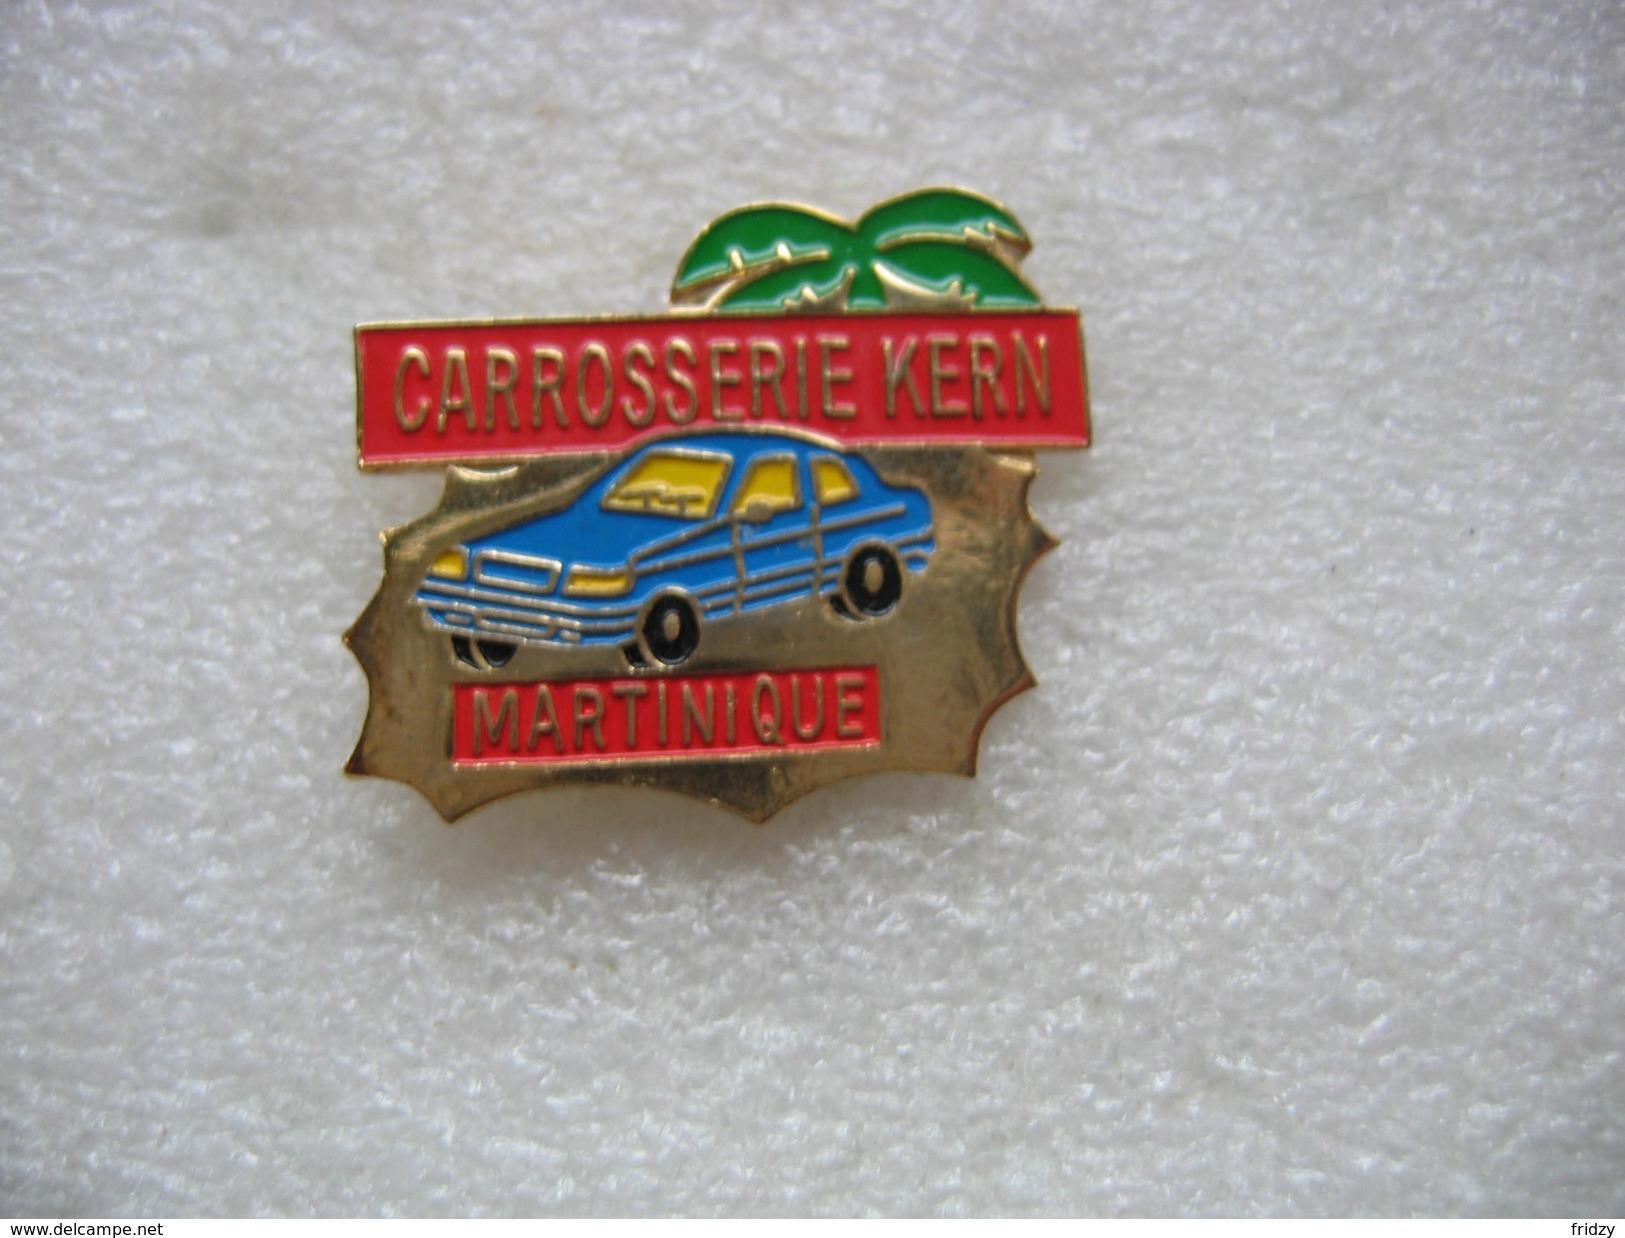 Pin's De La Carrosserie KERN En MARTINIQUE. Garage Automobile - Badges